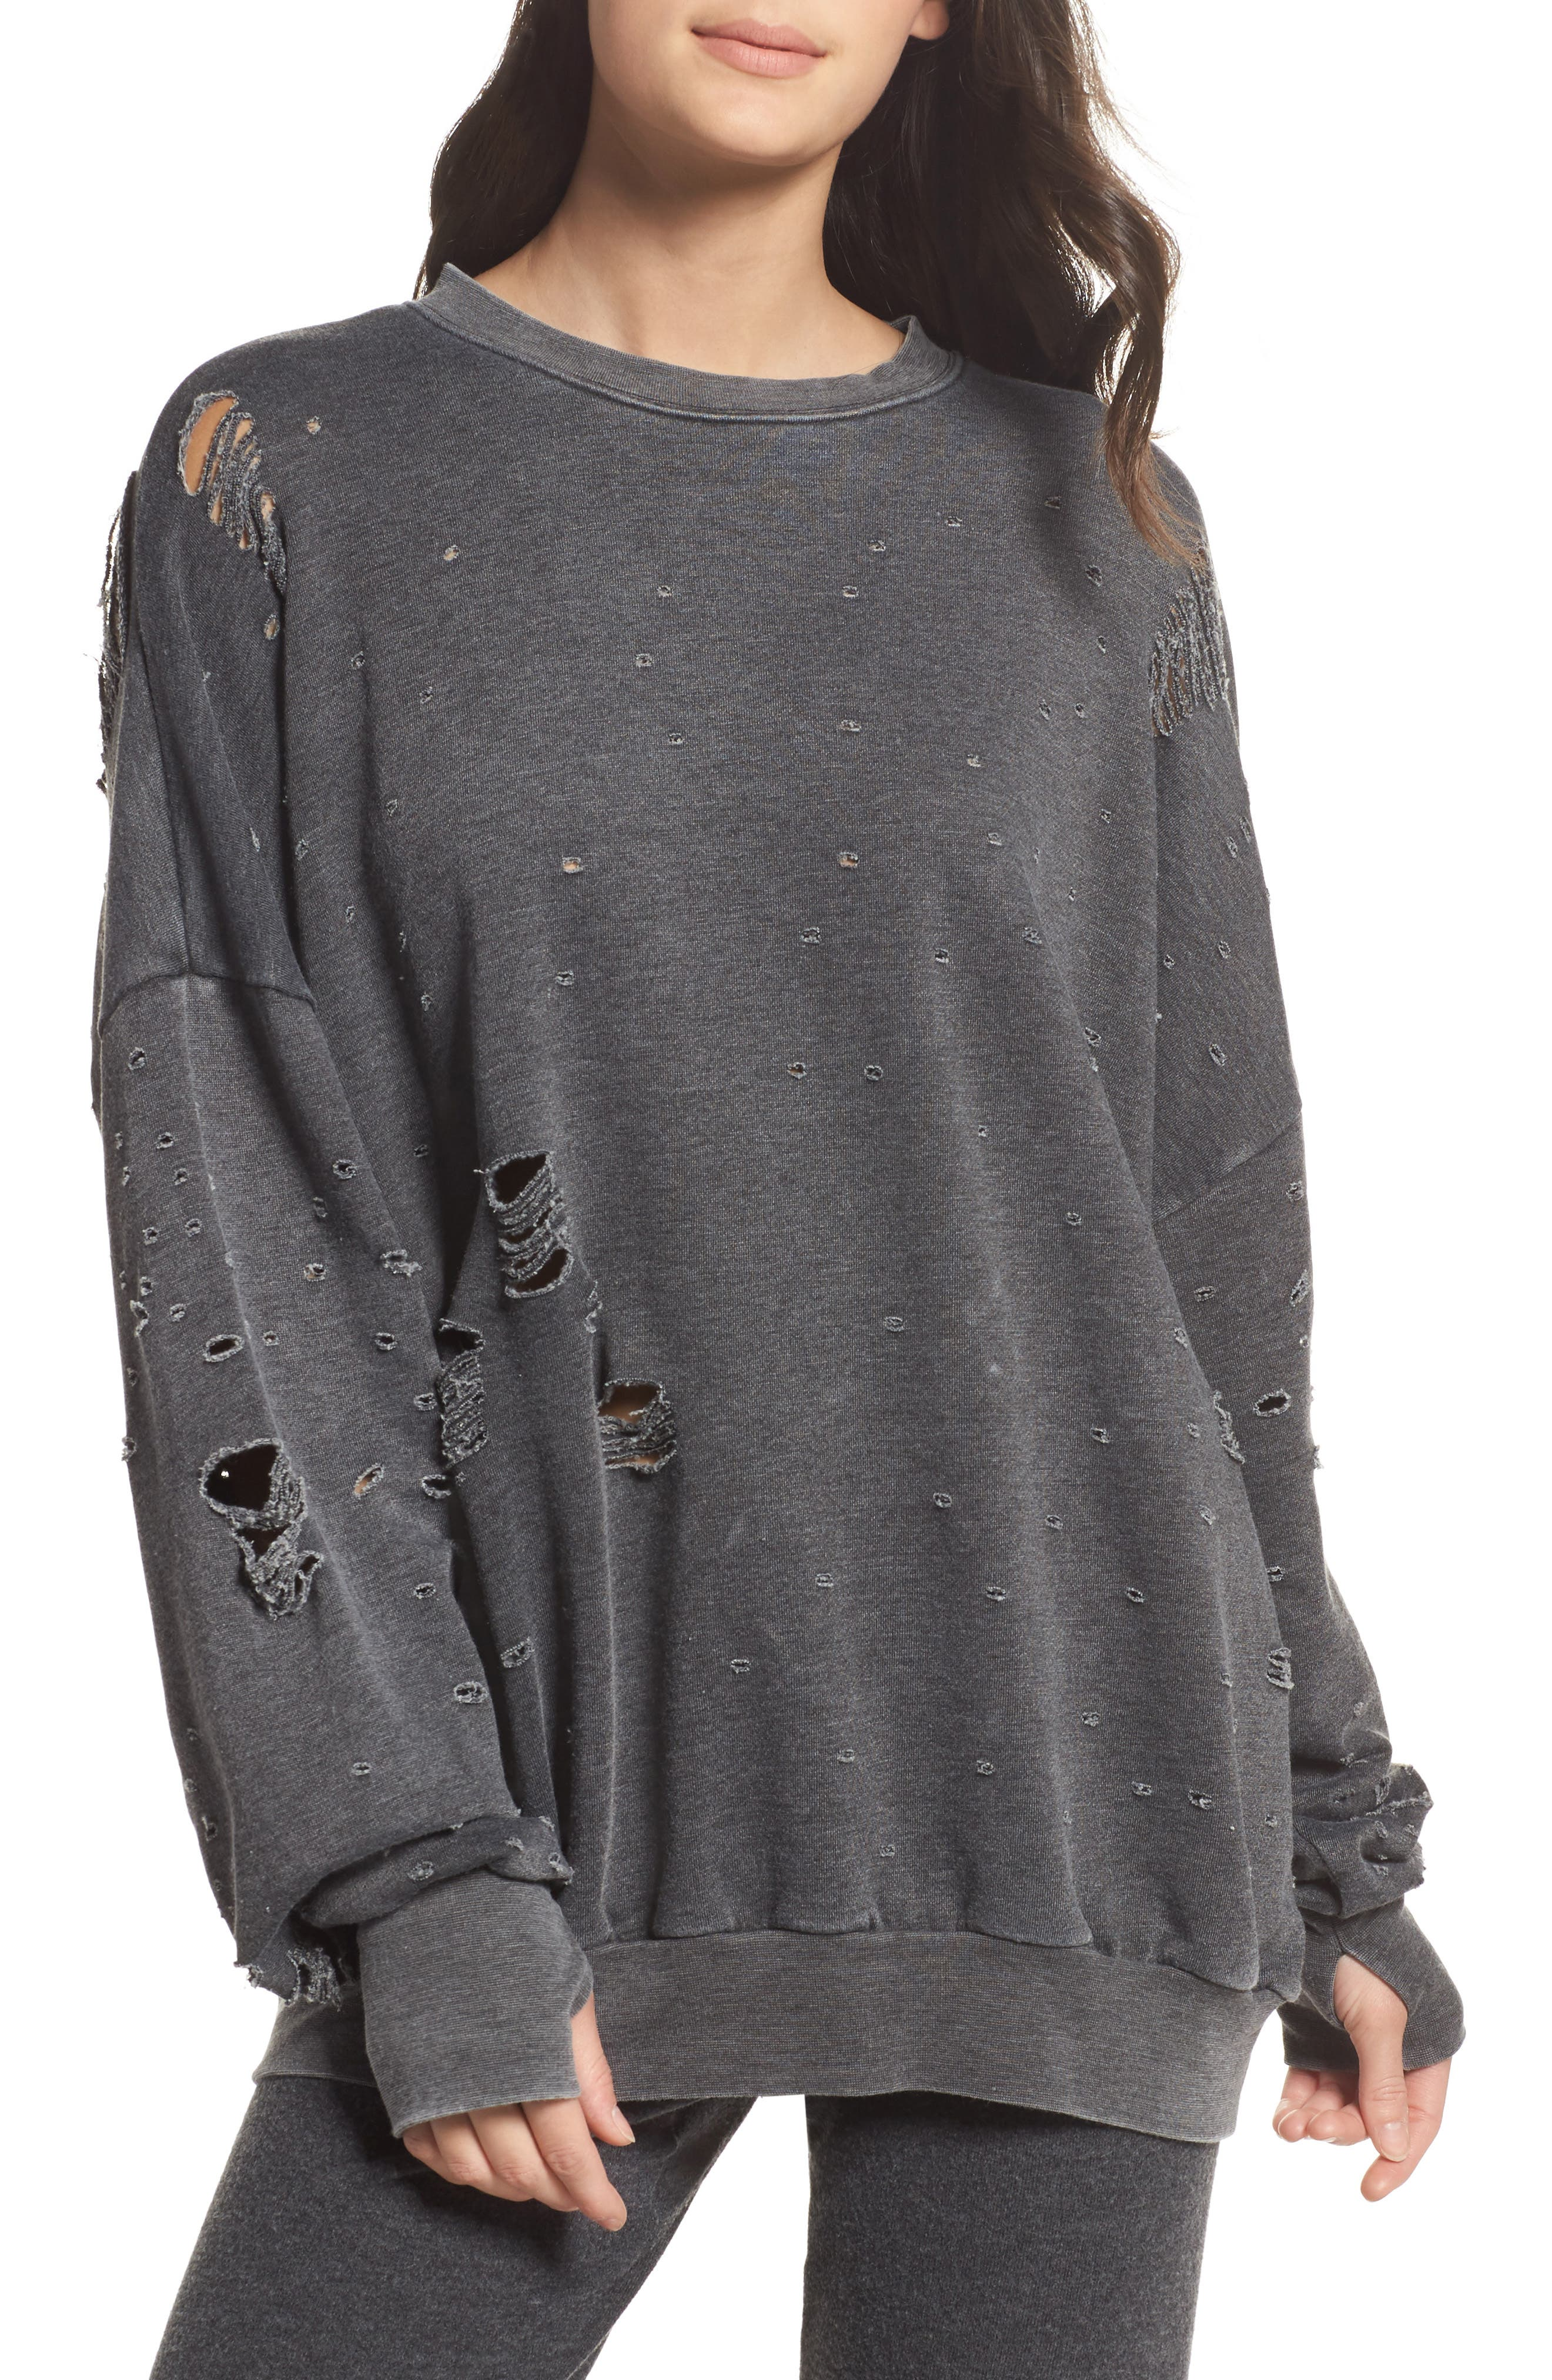 Thrasher Sweatshirt,                             Main thumbnail 1, color,